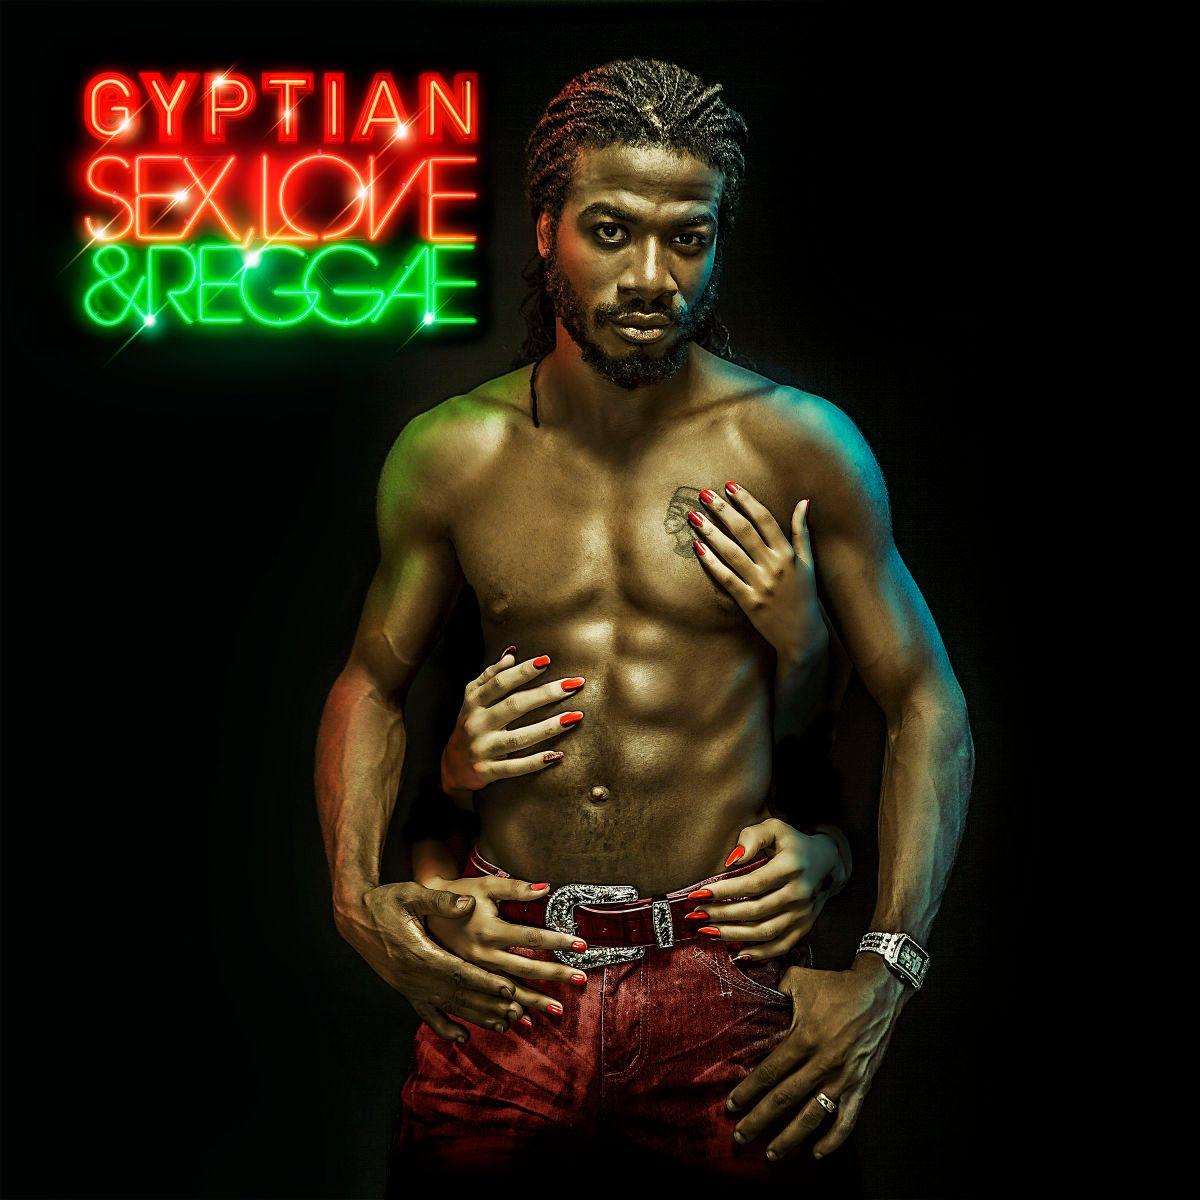 1gyptian_album_cover